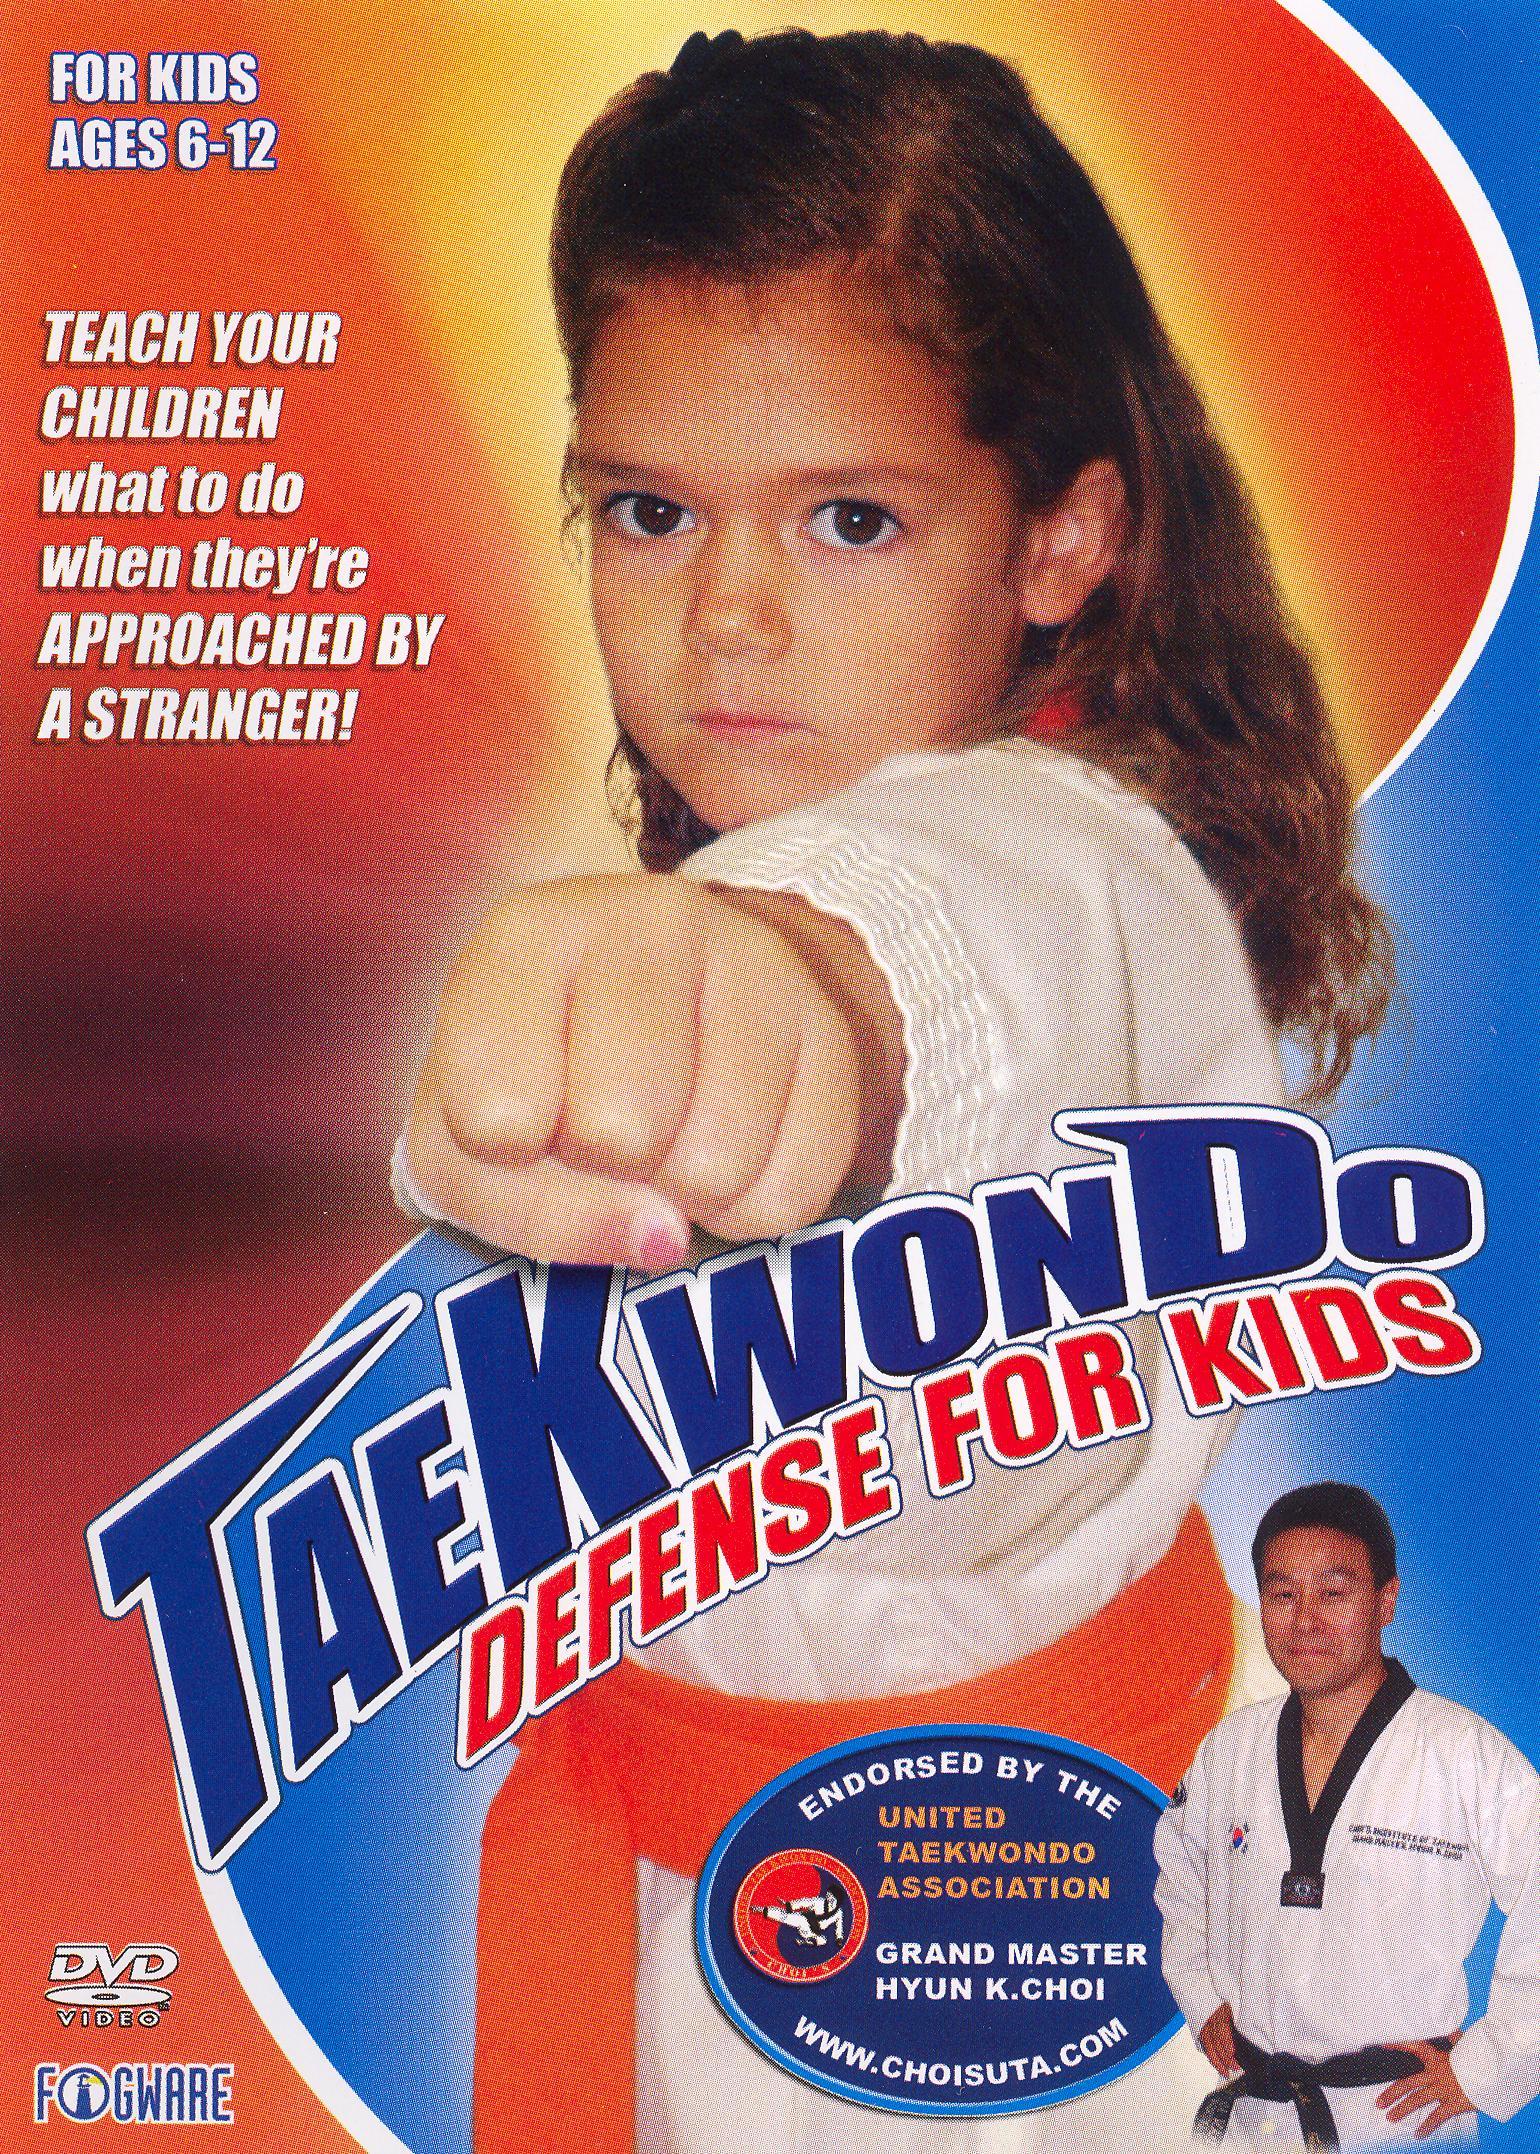 Taekwondo Defense for Kids